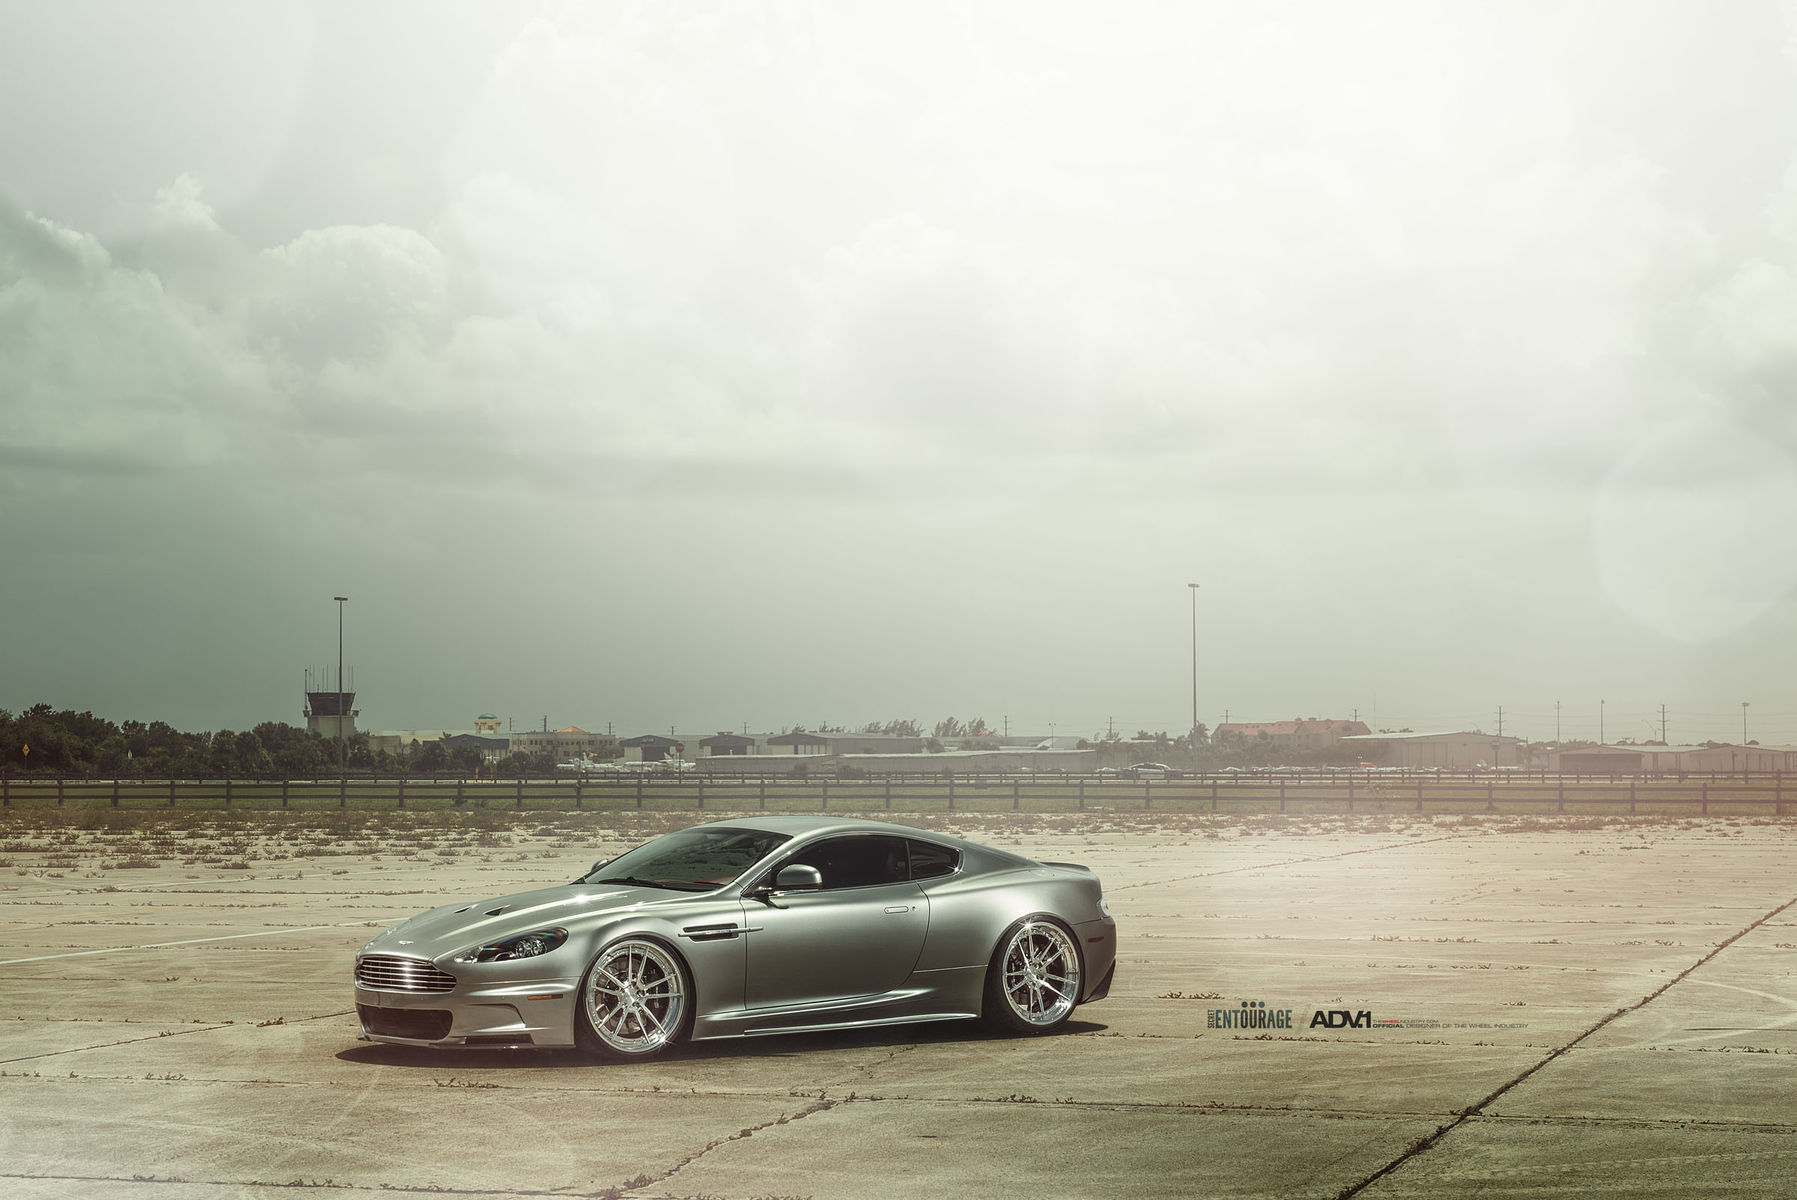 Aston Martin DBS | Aston Martin DBS